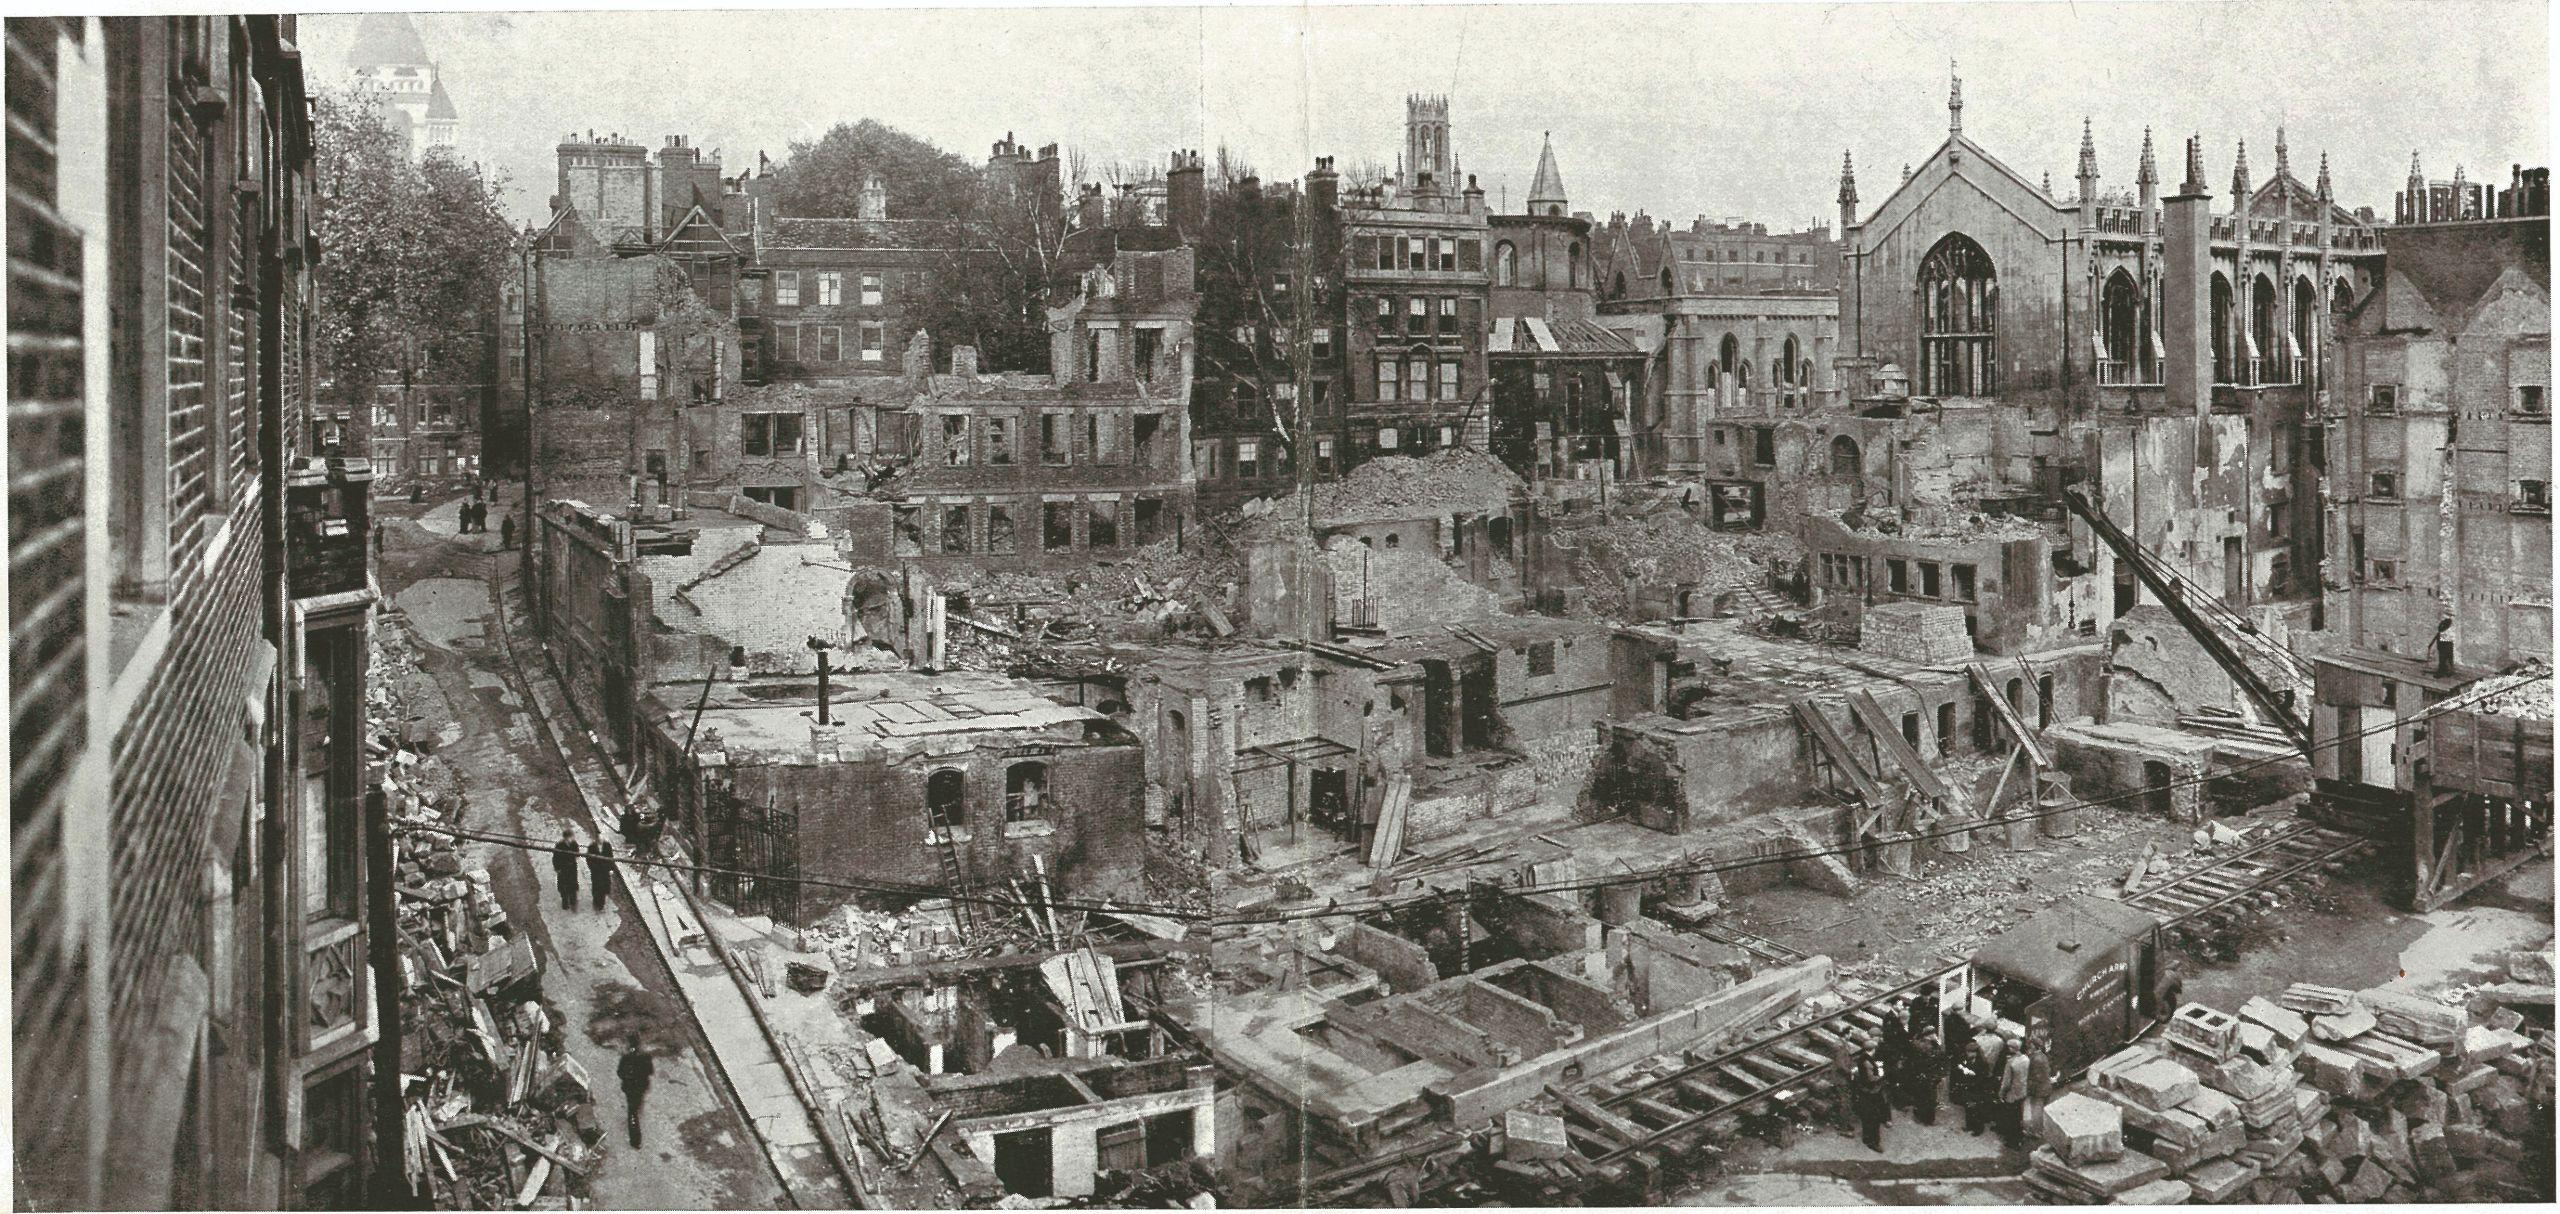 68. MT ordeal bomb damage.jpg